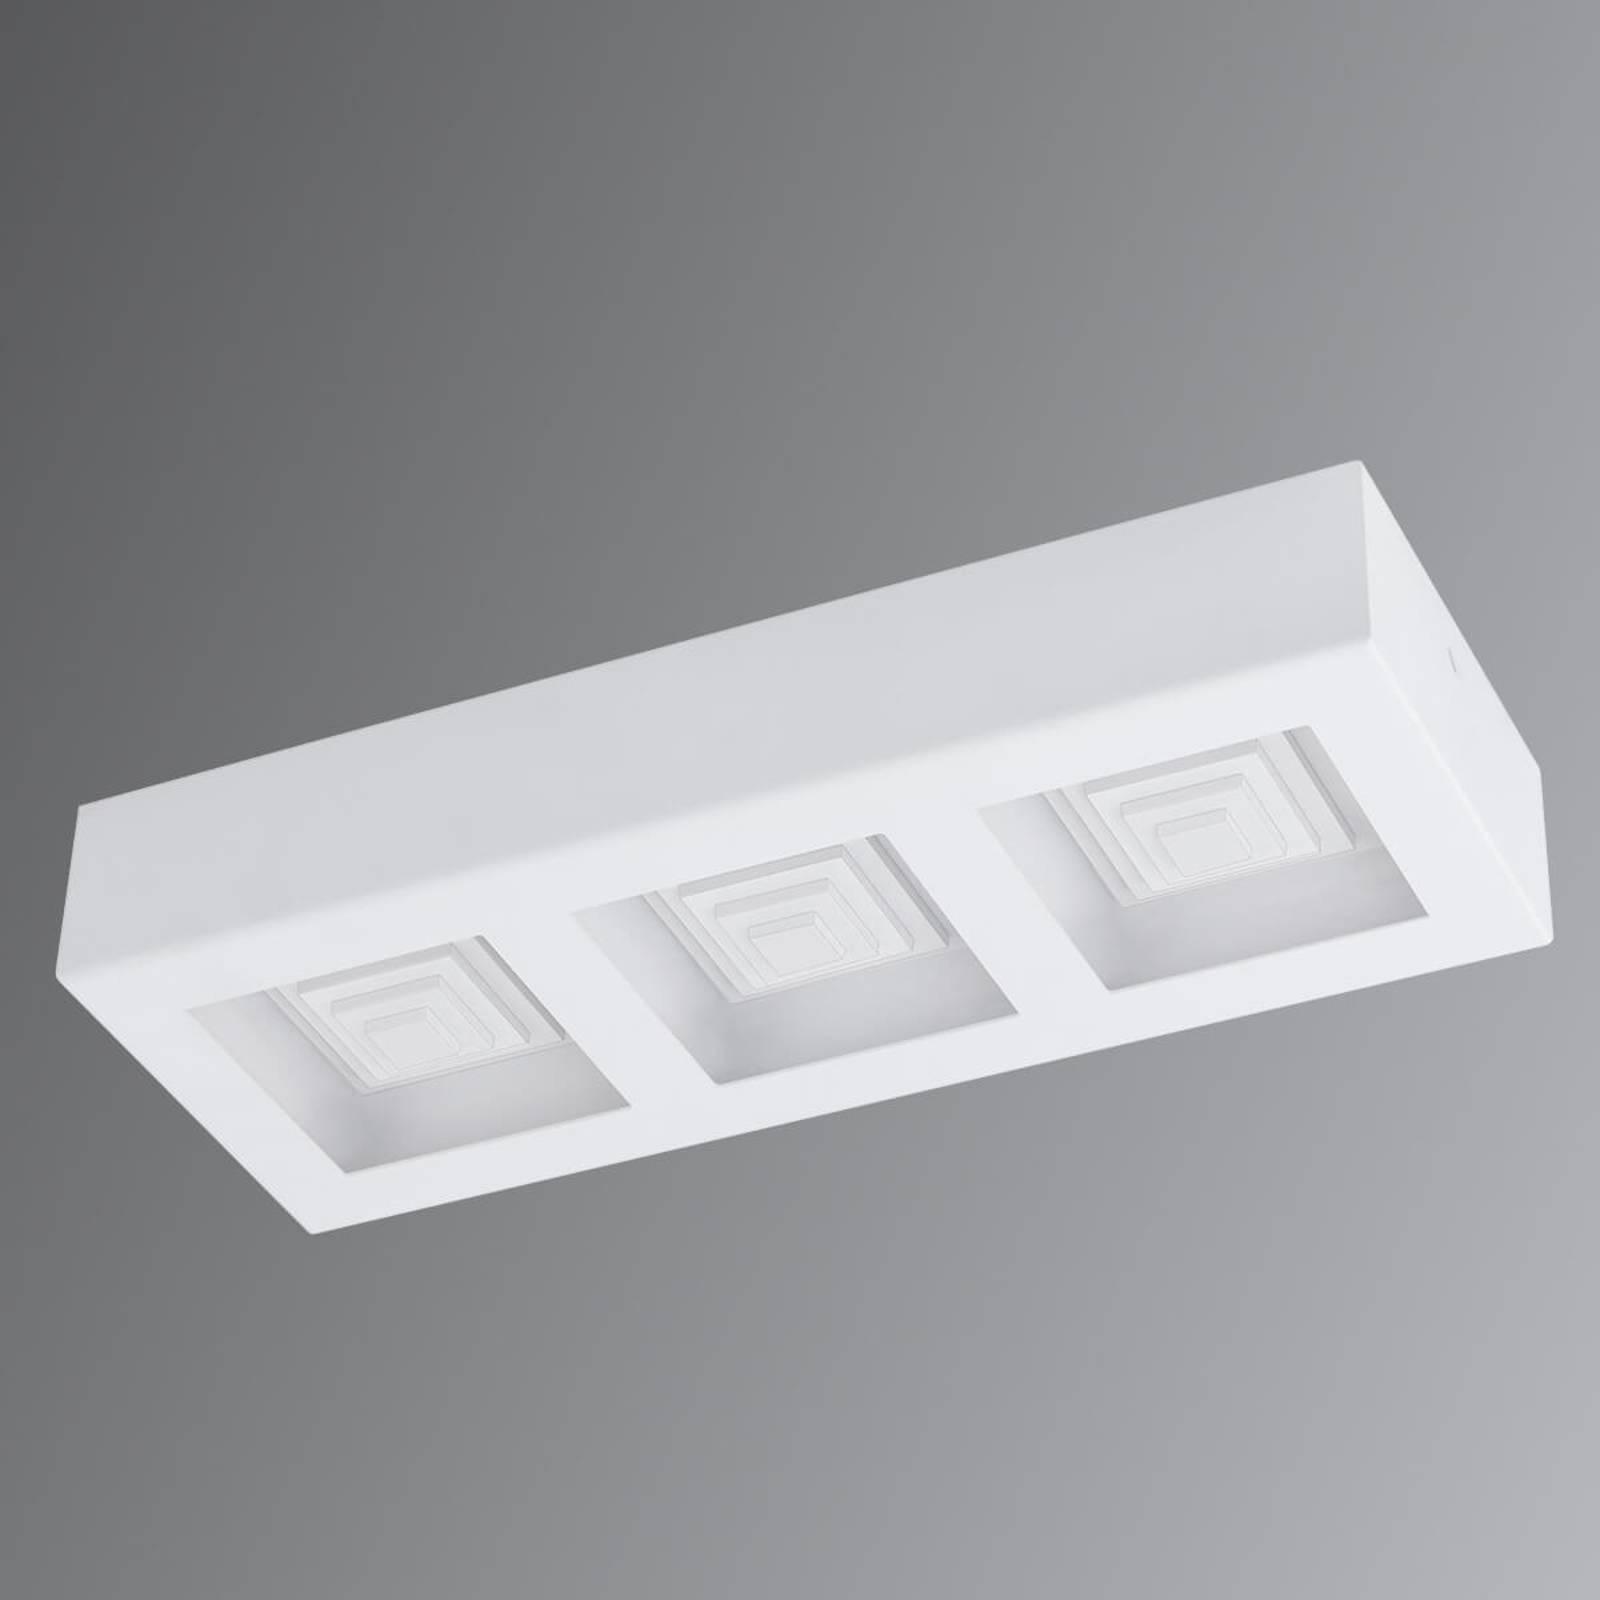 Ferreros - 3-lamps LED plafondlamp in wit